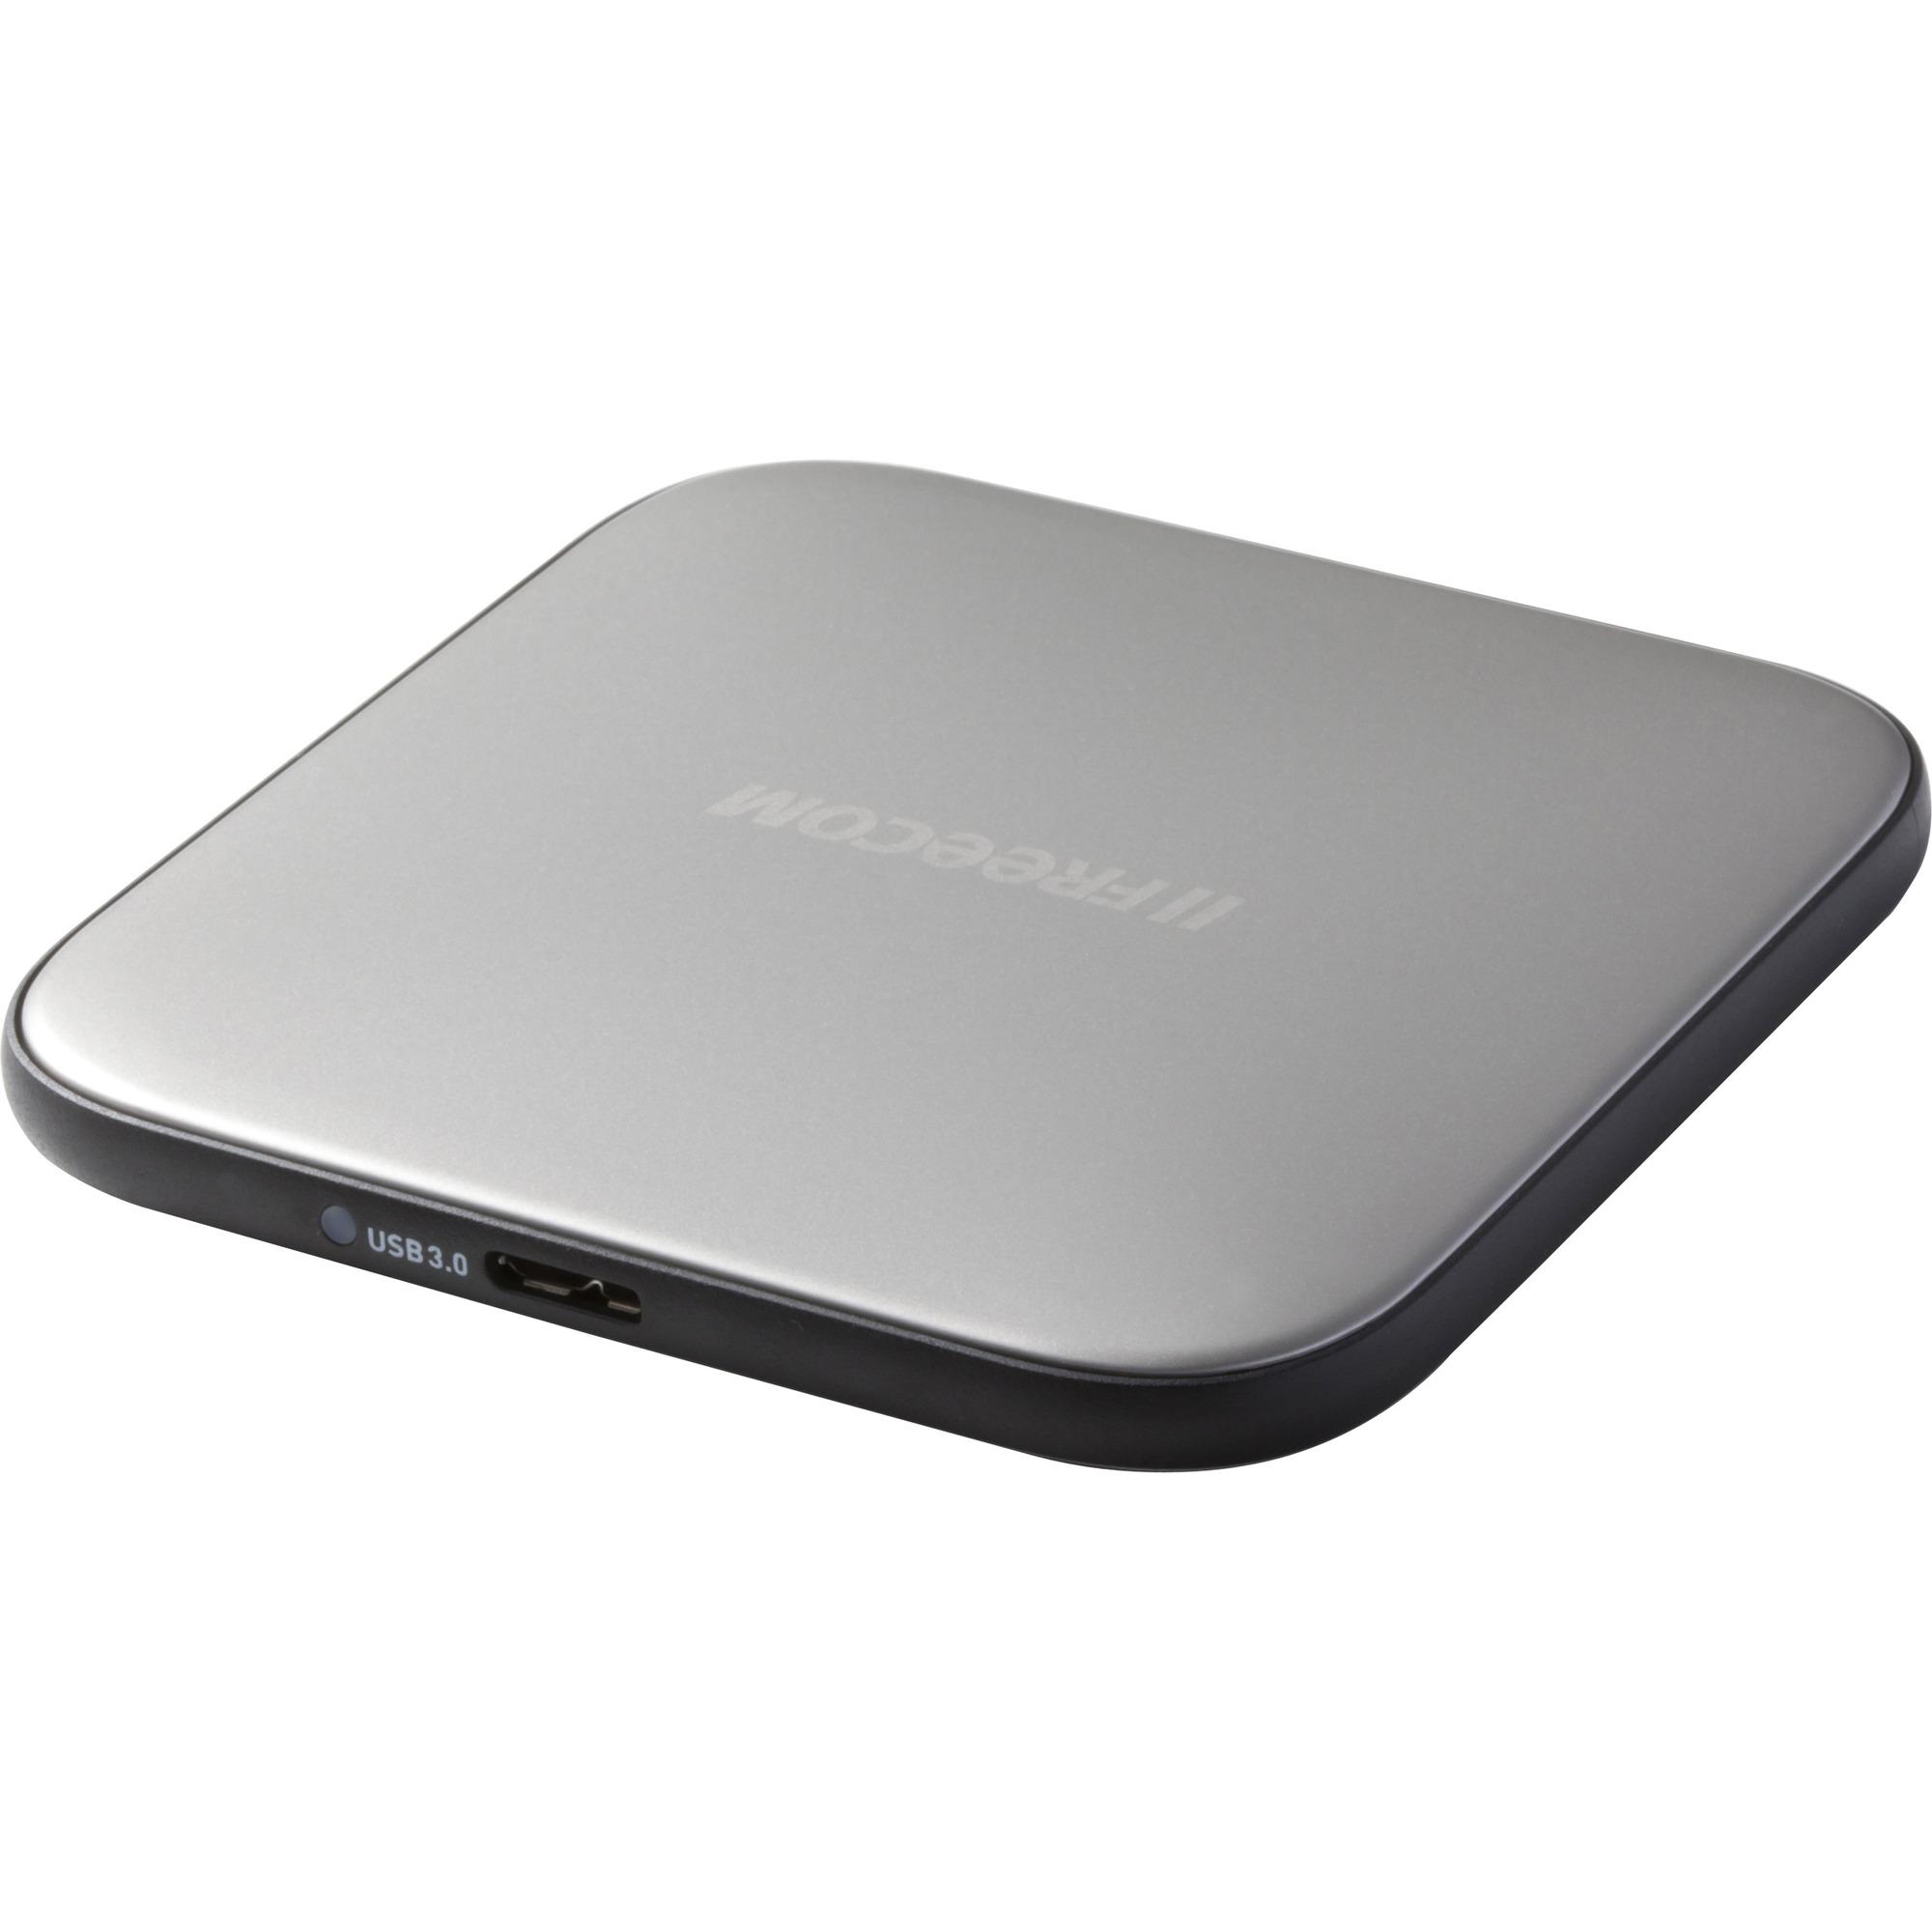 Freecom Mobile Drive Sq 500 GB 2.5inch External Hard Drive